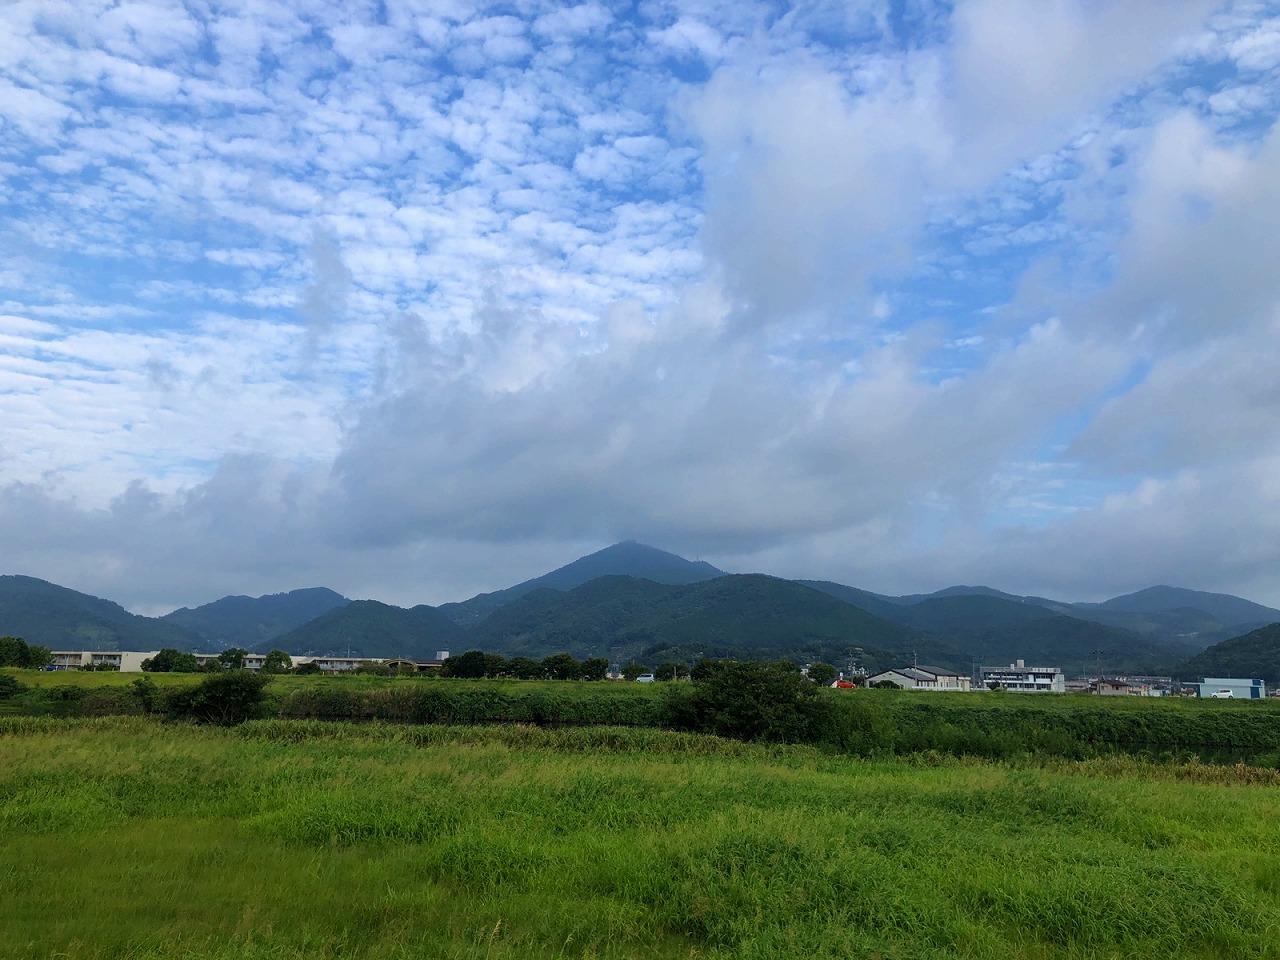 2018.9.5今朝の金峰山